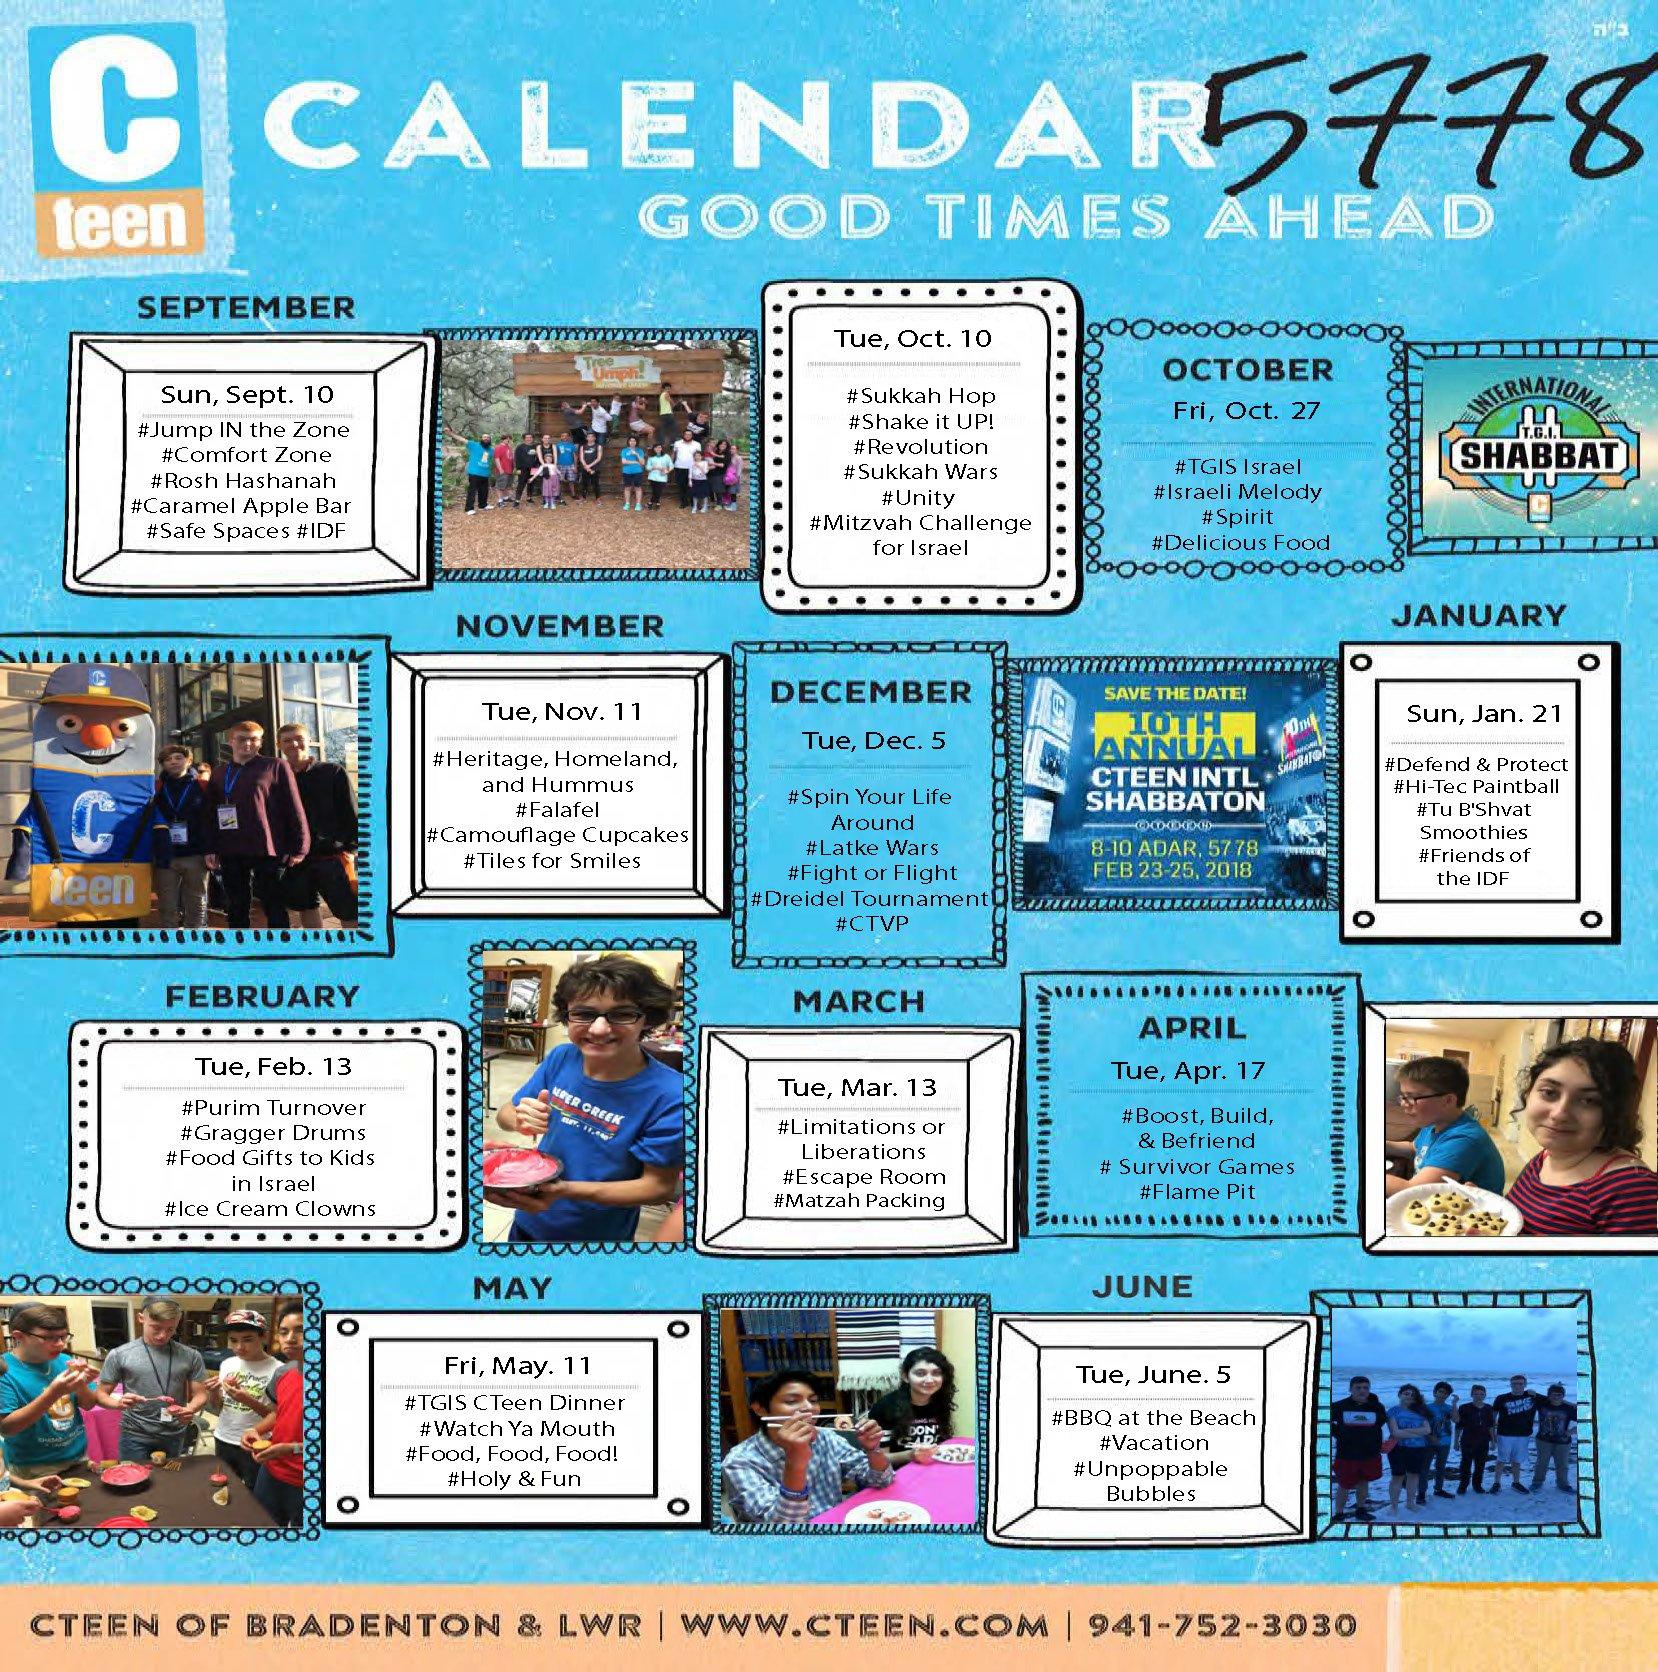 CTeen-Calendar-5778-Editable TEMP new smaller2.jpg